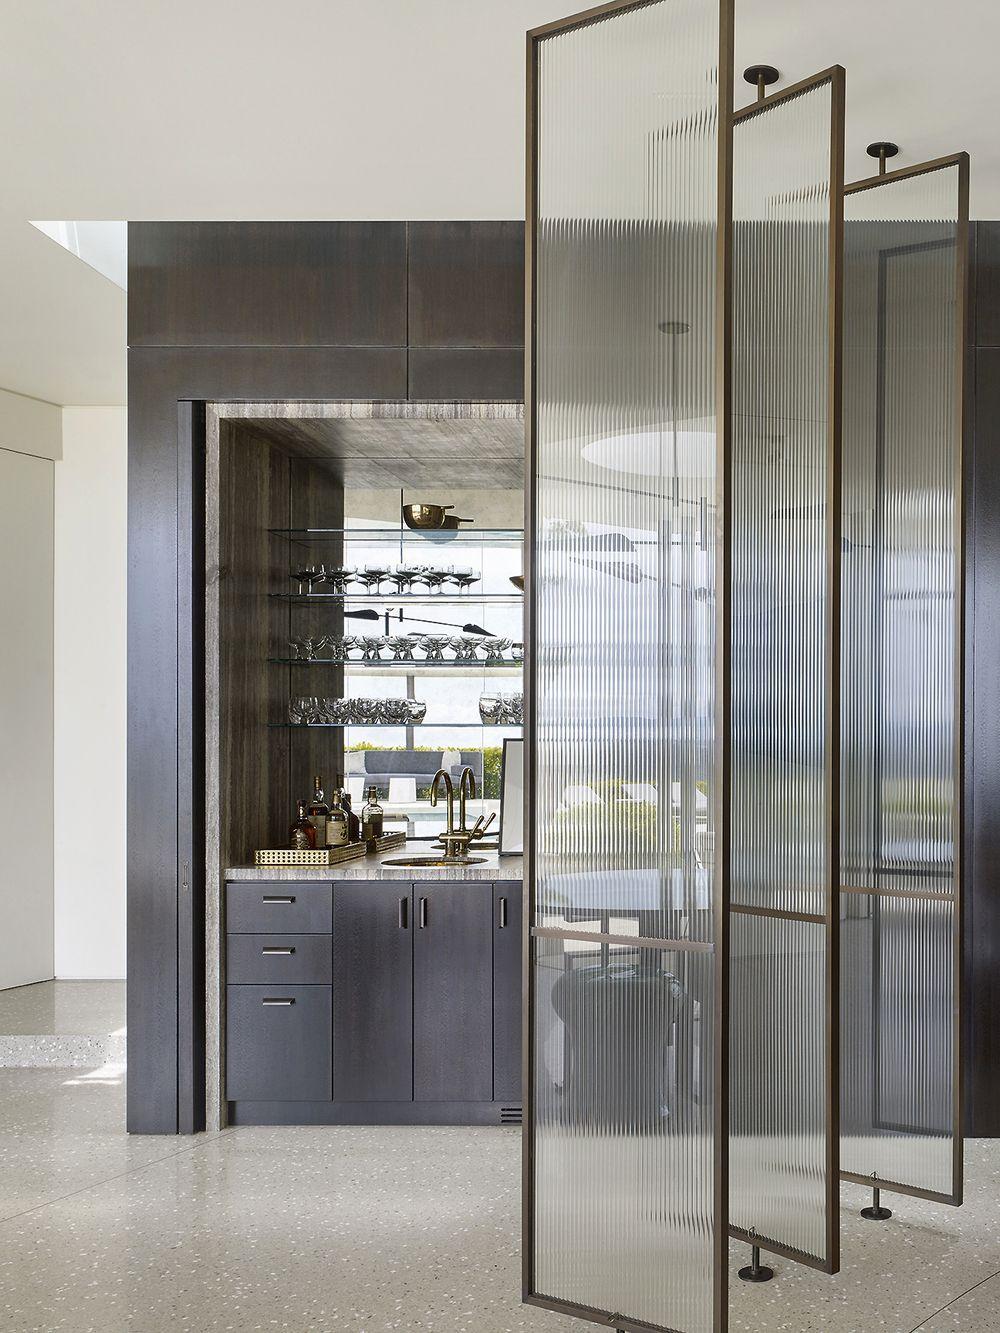 Inspiration sÉparations pinterest glass partition glass and